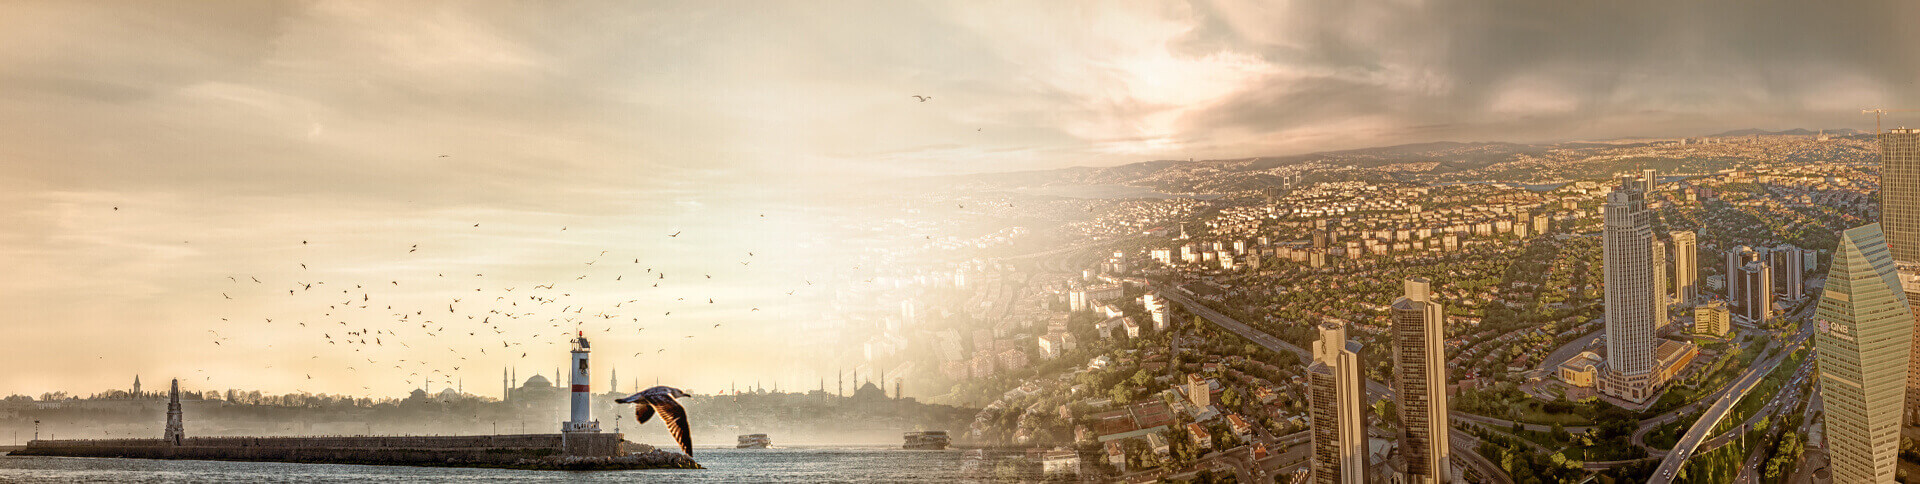 MELARES | املاک و مستغلات استانبول - املاک ترکیه - تابعیت ترکیه